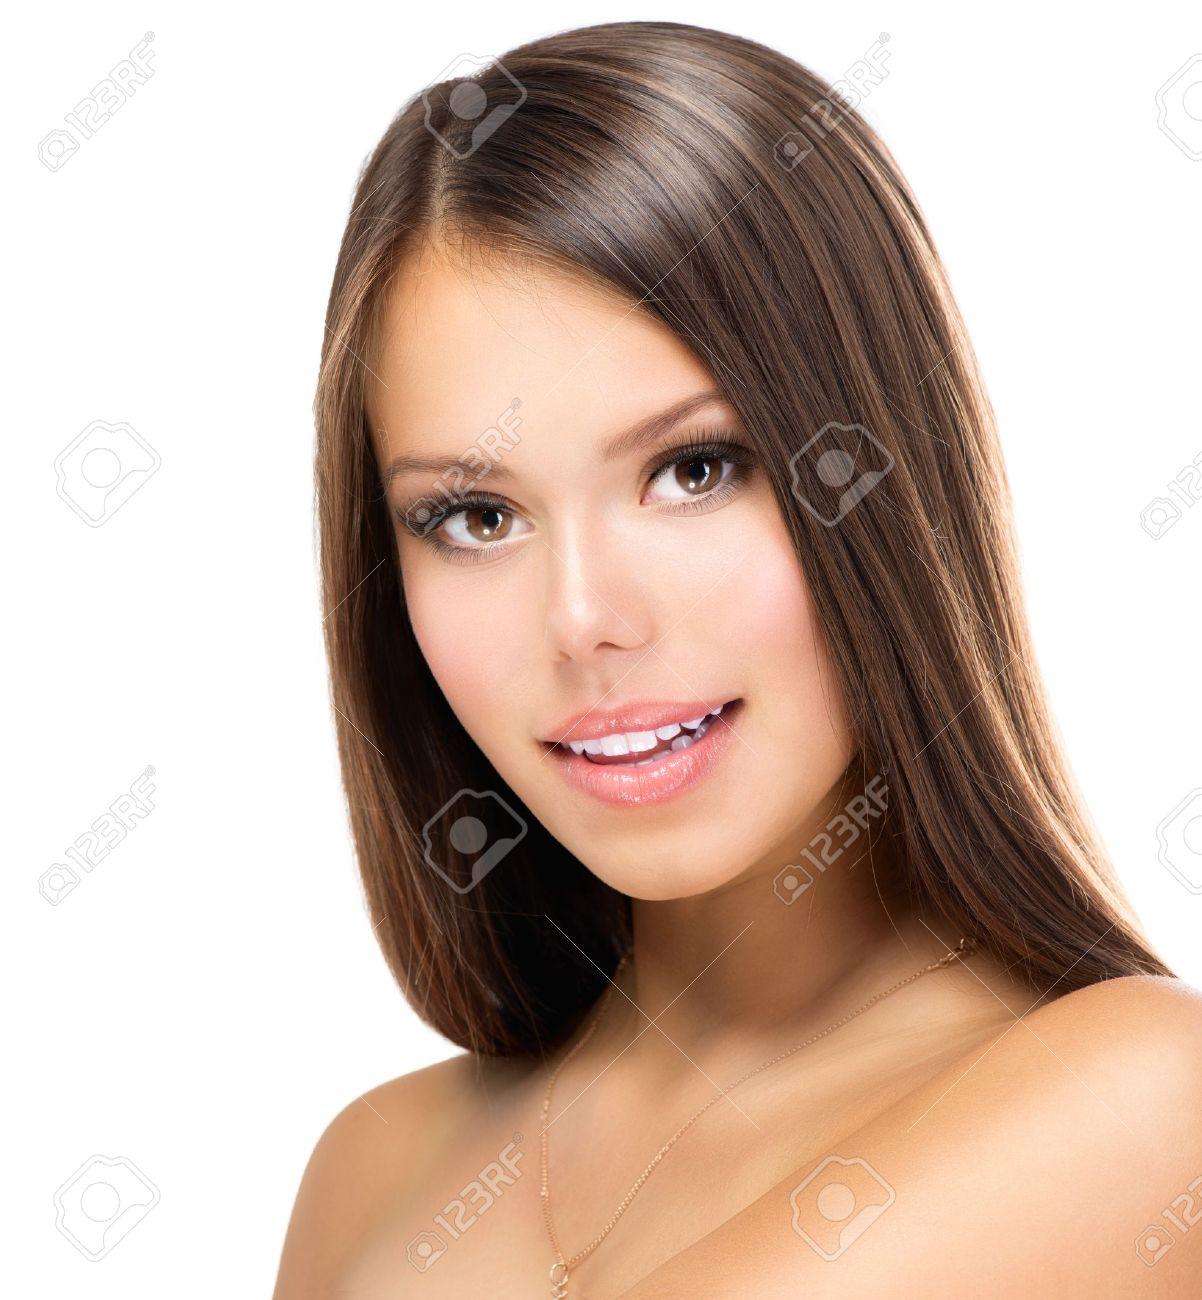 holly madison playboy nude